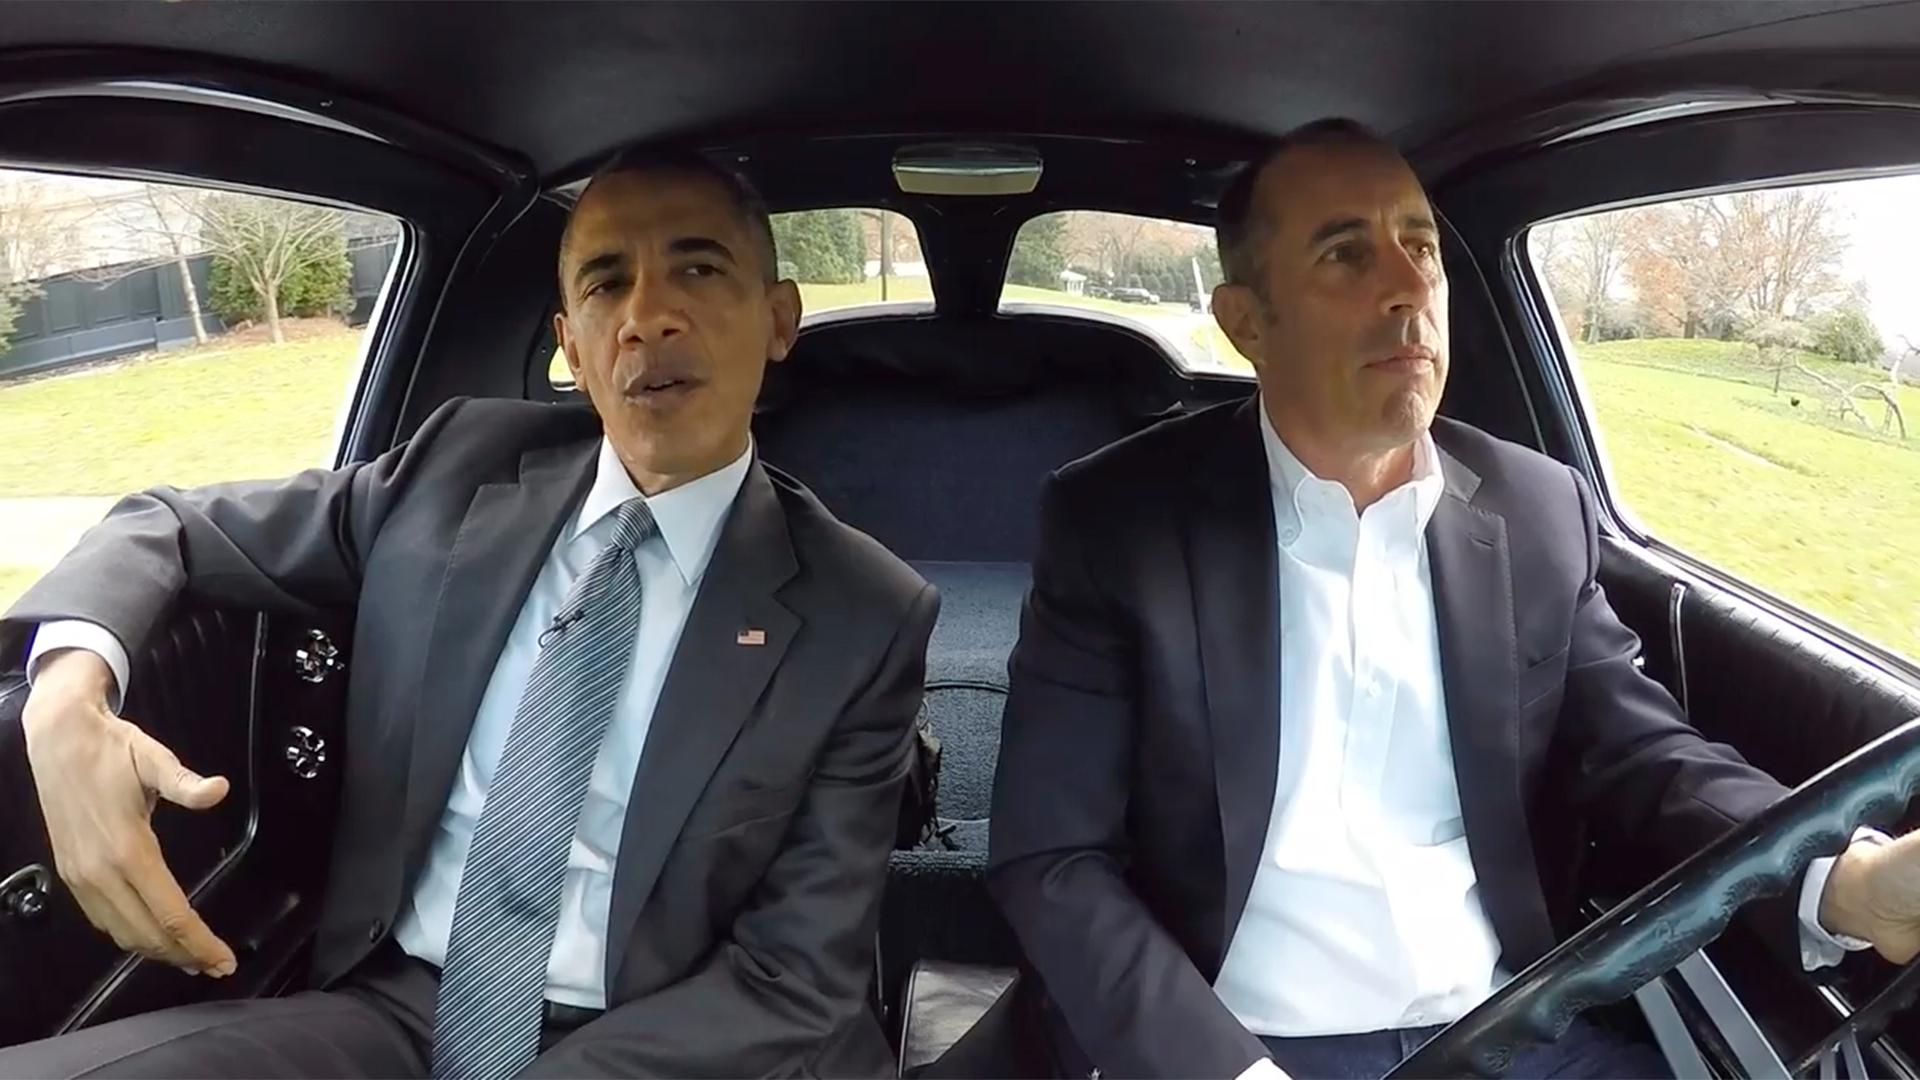 Commedians In Cars: President Obama, Jerry Seinfeld Talk Underwear, World